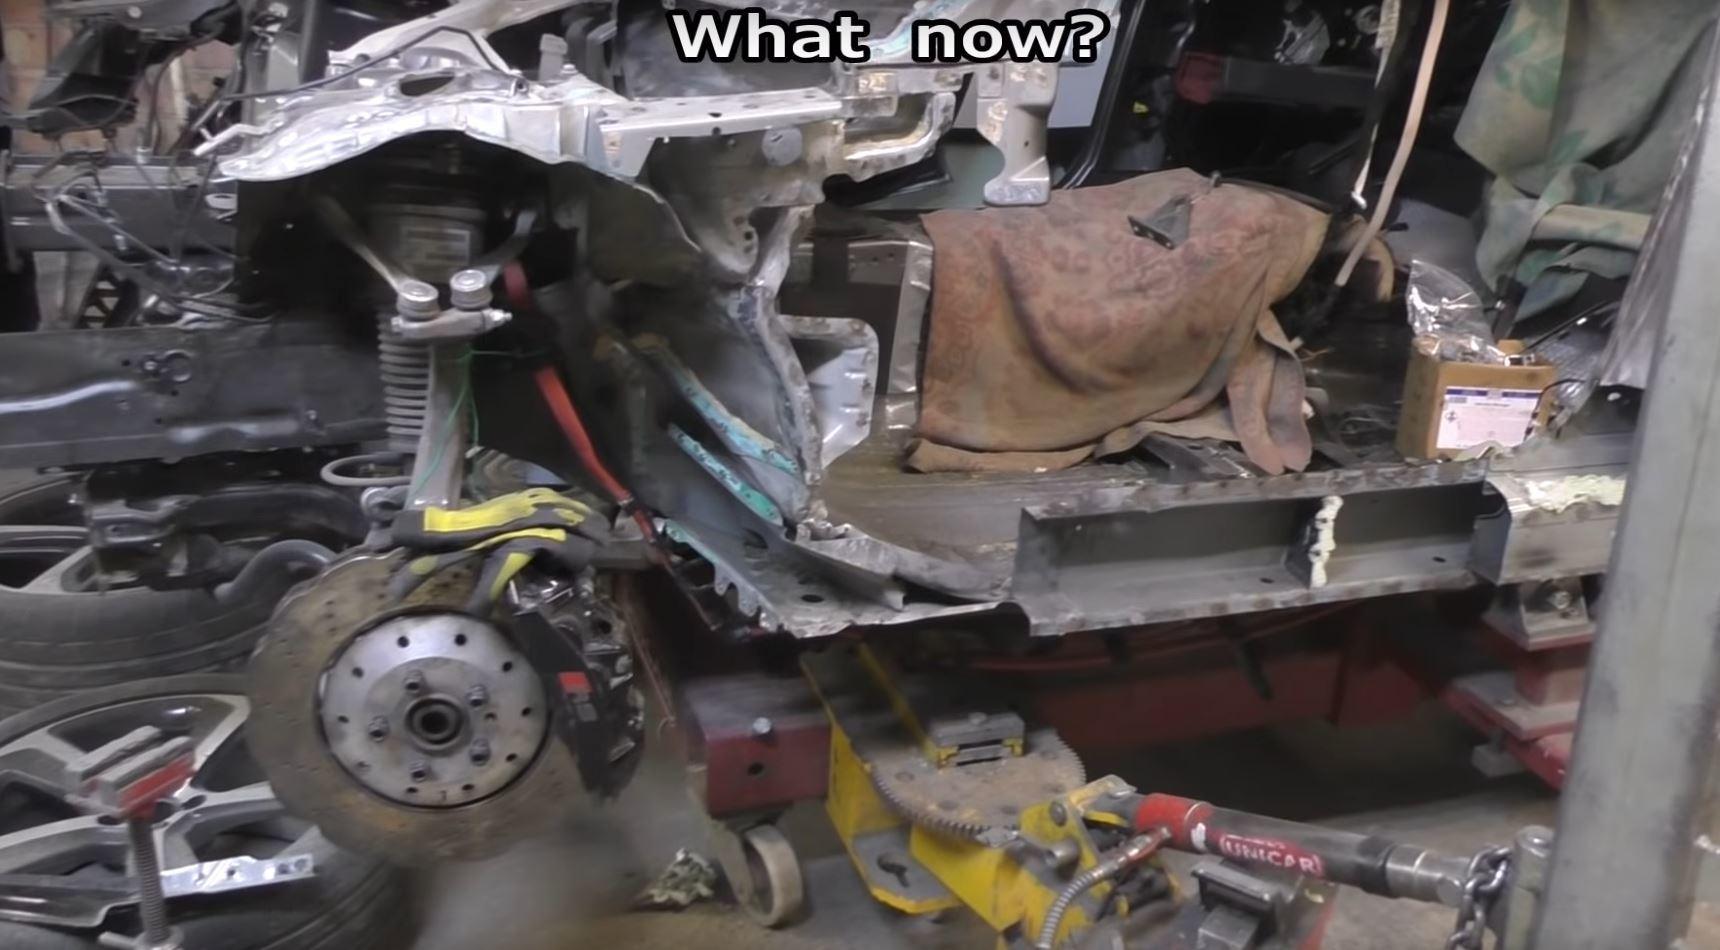 Xe sang Audi RS7 nát bấy hồi sinh long lanh sau 70 giờ